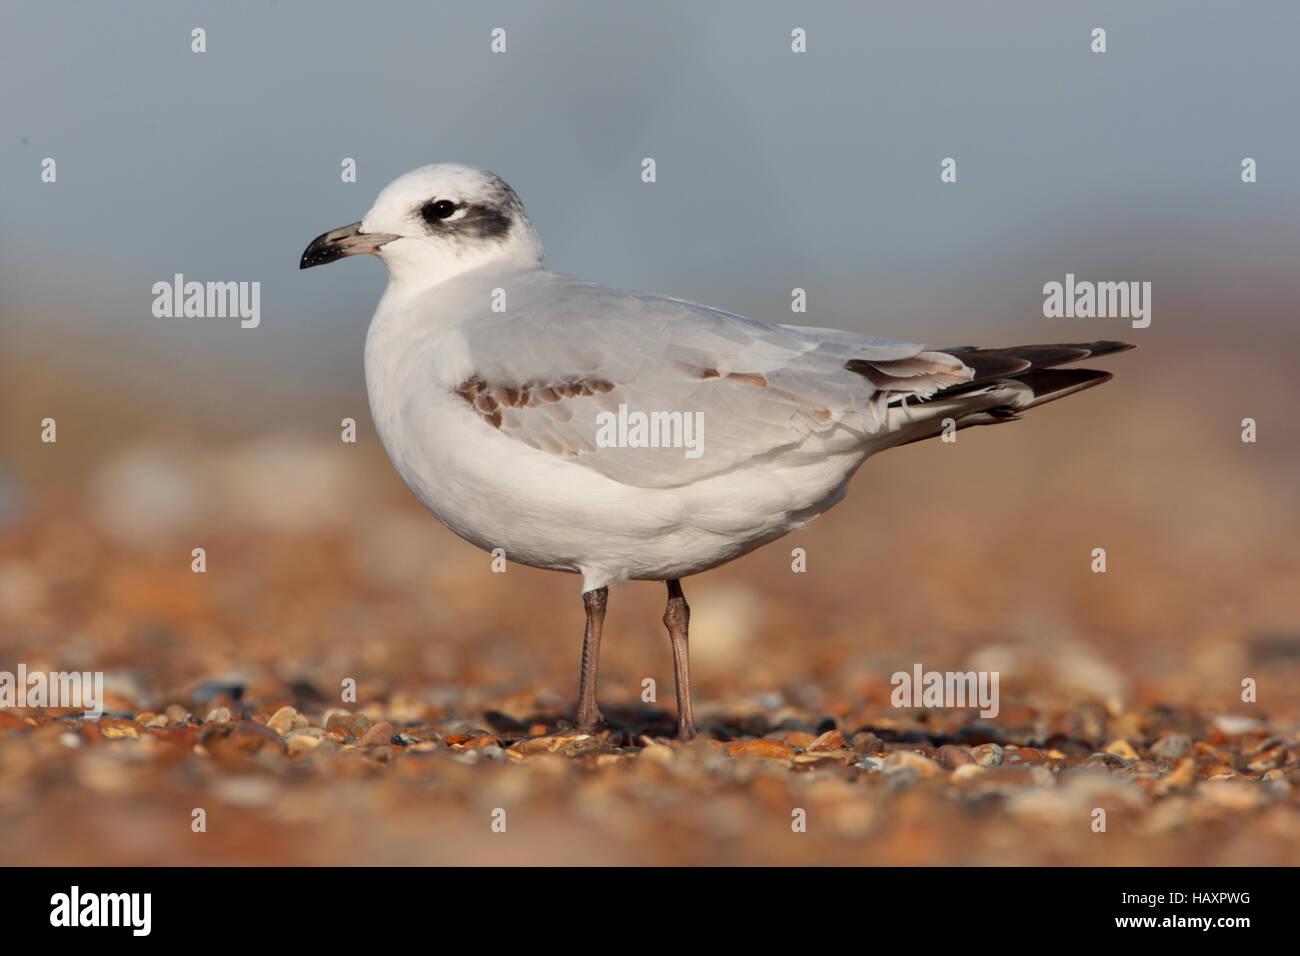 First winter Mediterranean Gull on an English beach in winter - Stock Image